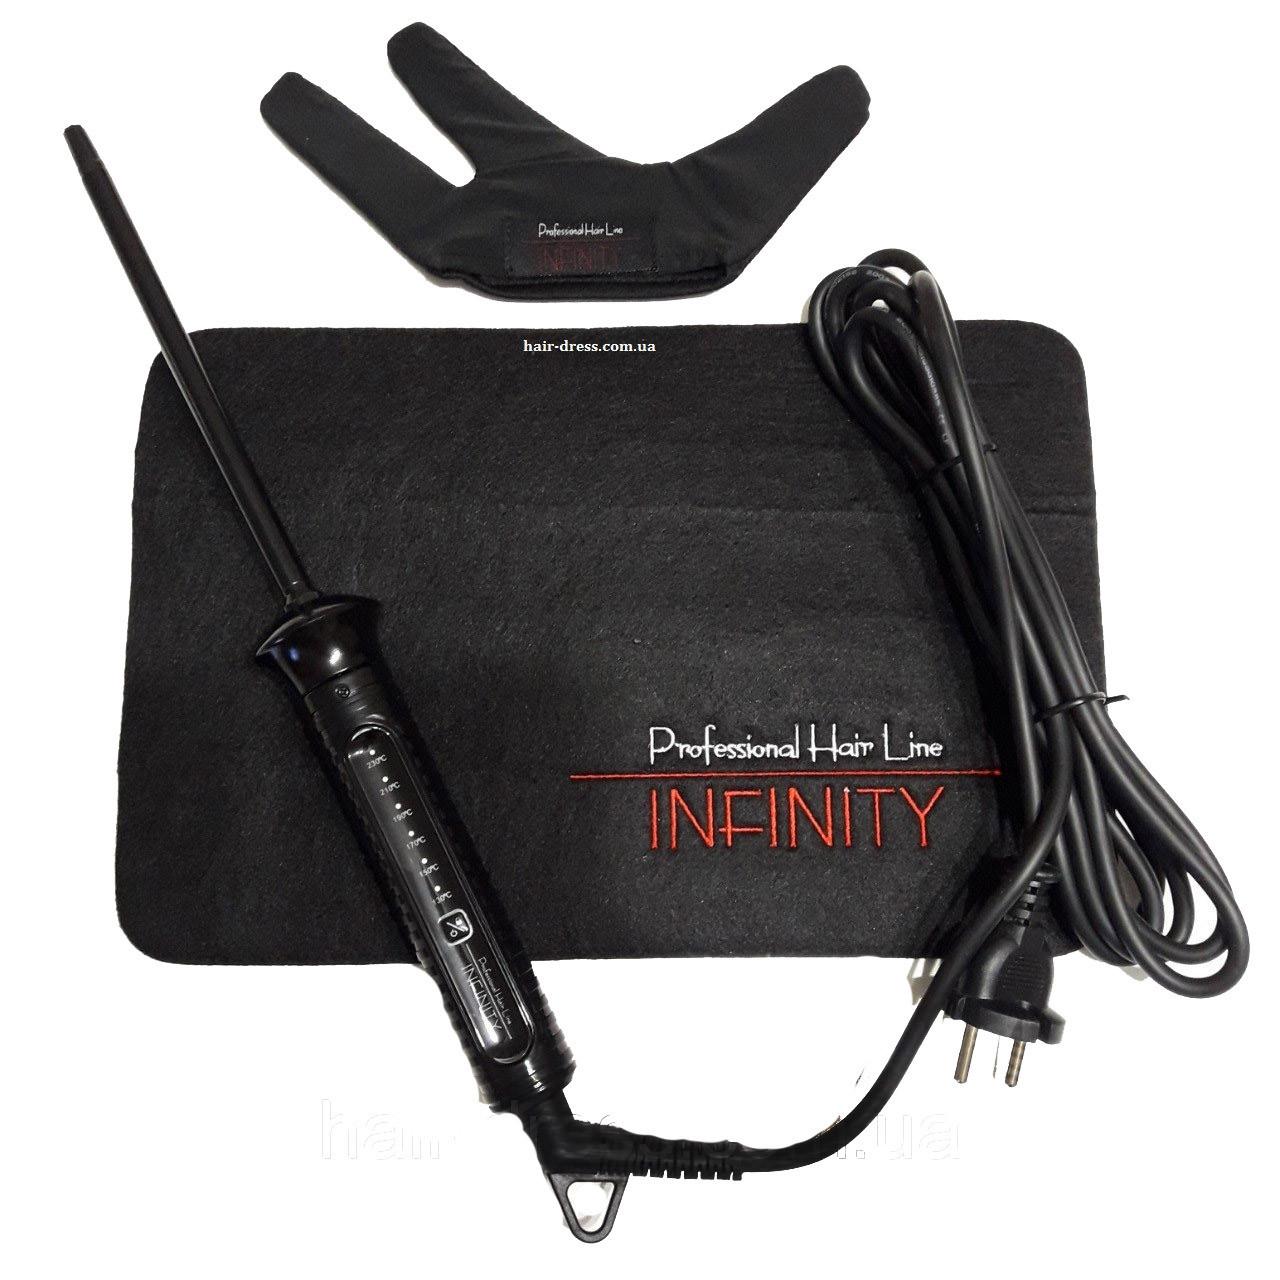 Плойка для кудрей Infinity Professional Narrow Curl IN6020, 9 мм